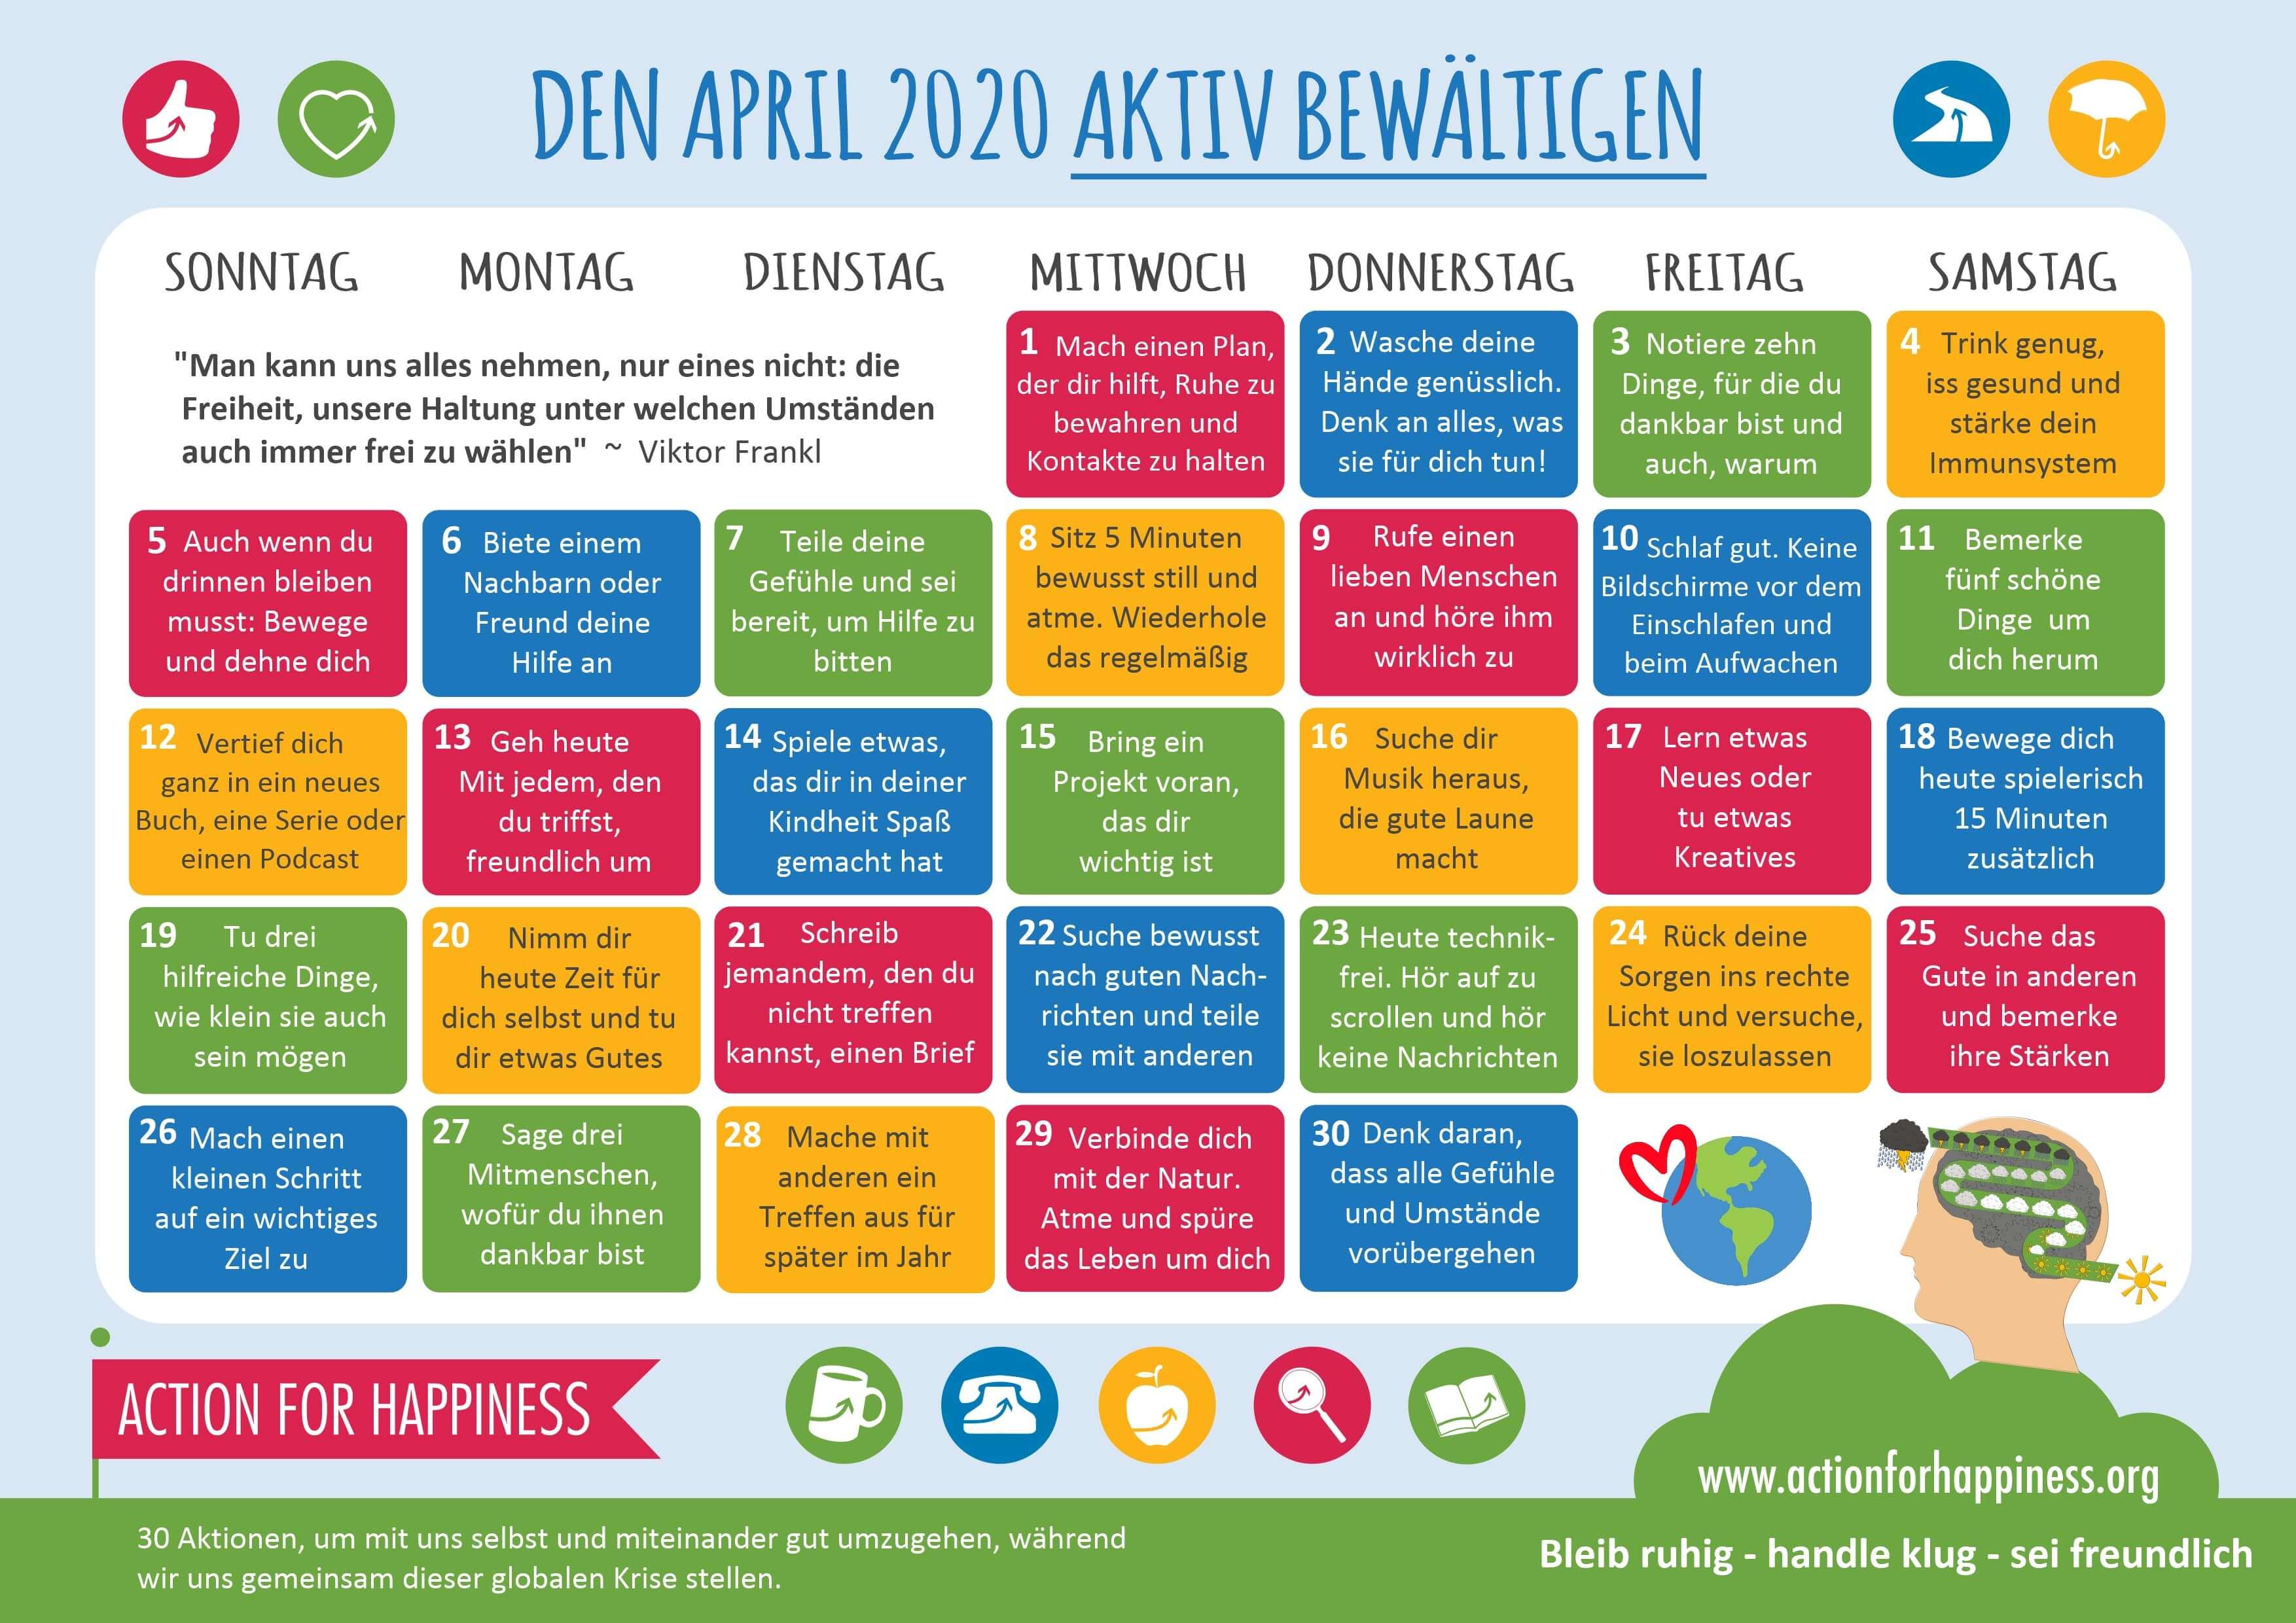 Angelika's German Tuition and Translation - april 2020